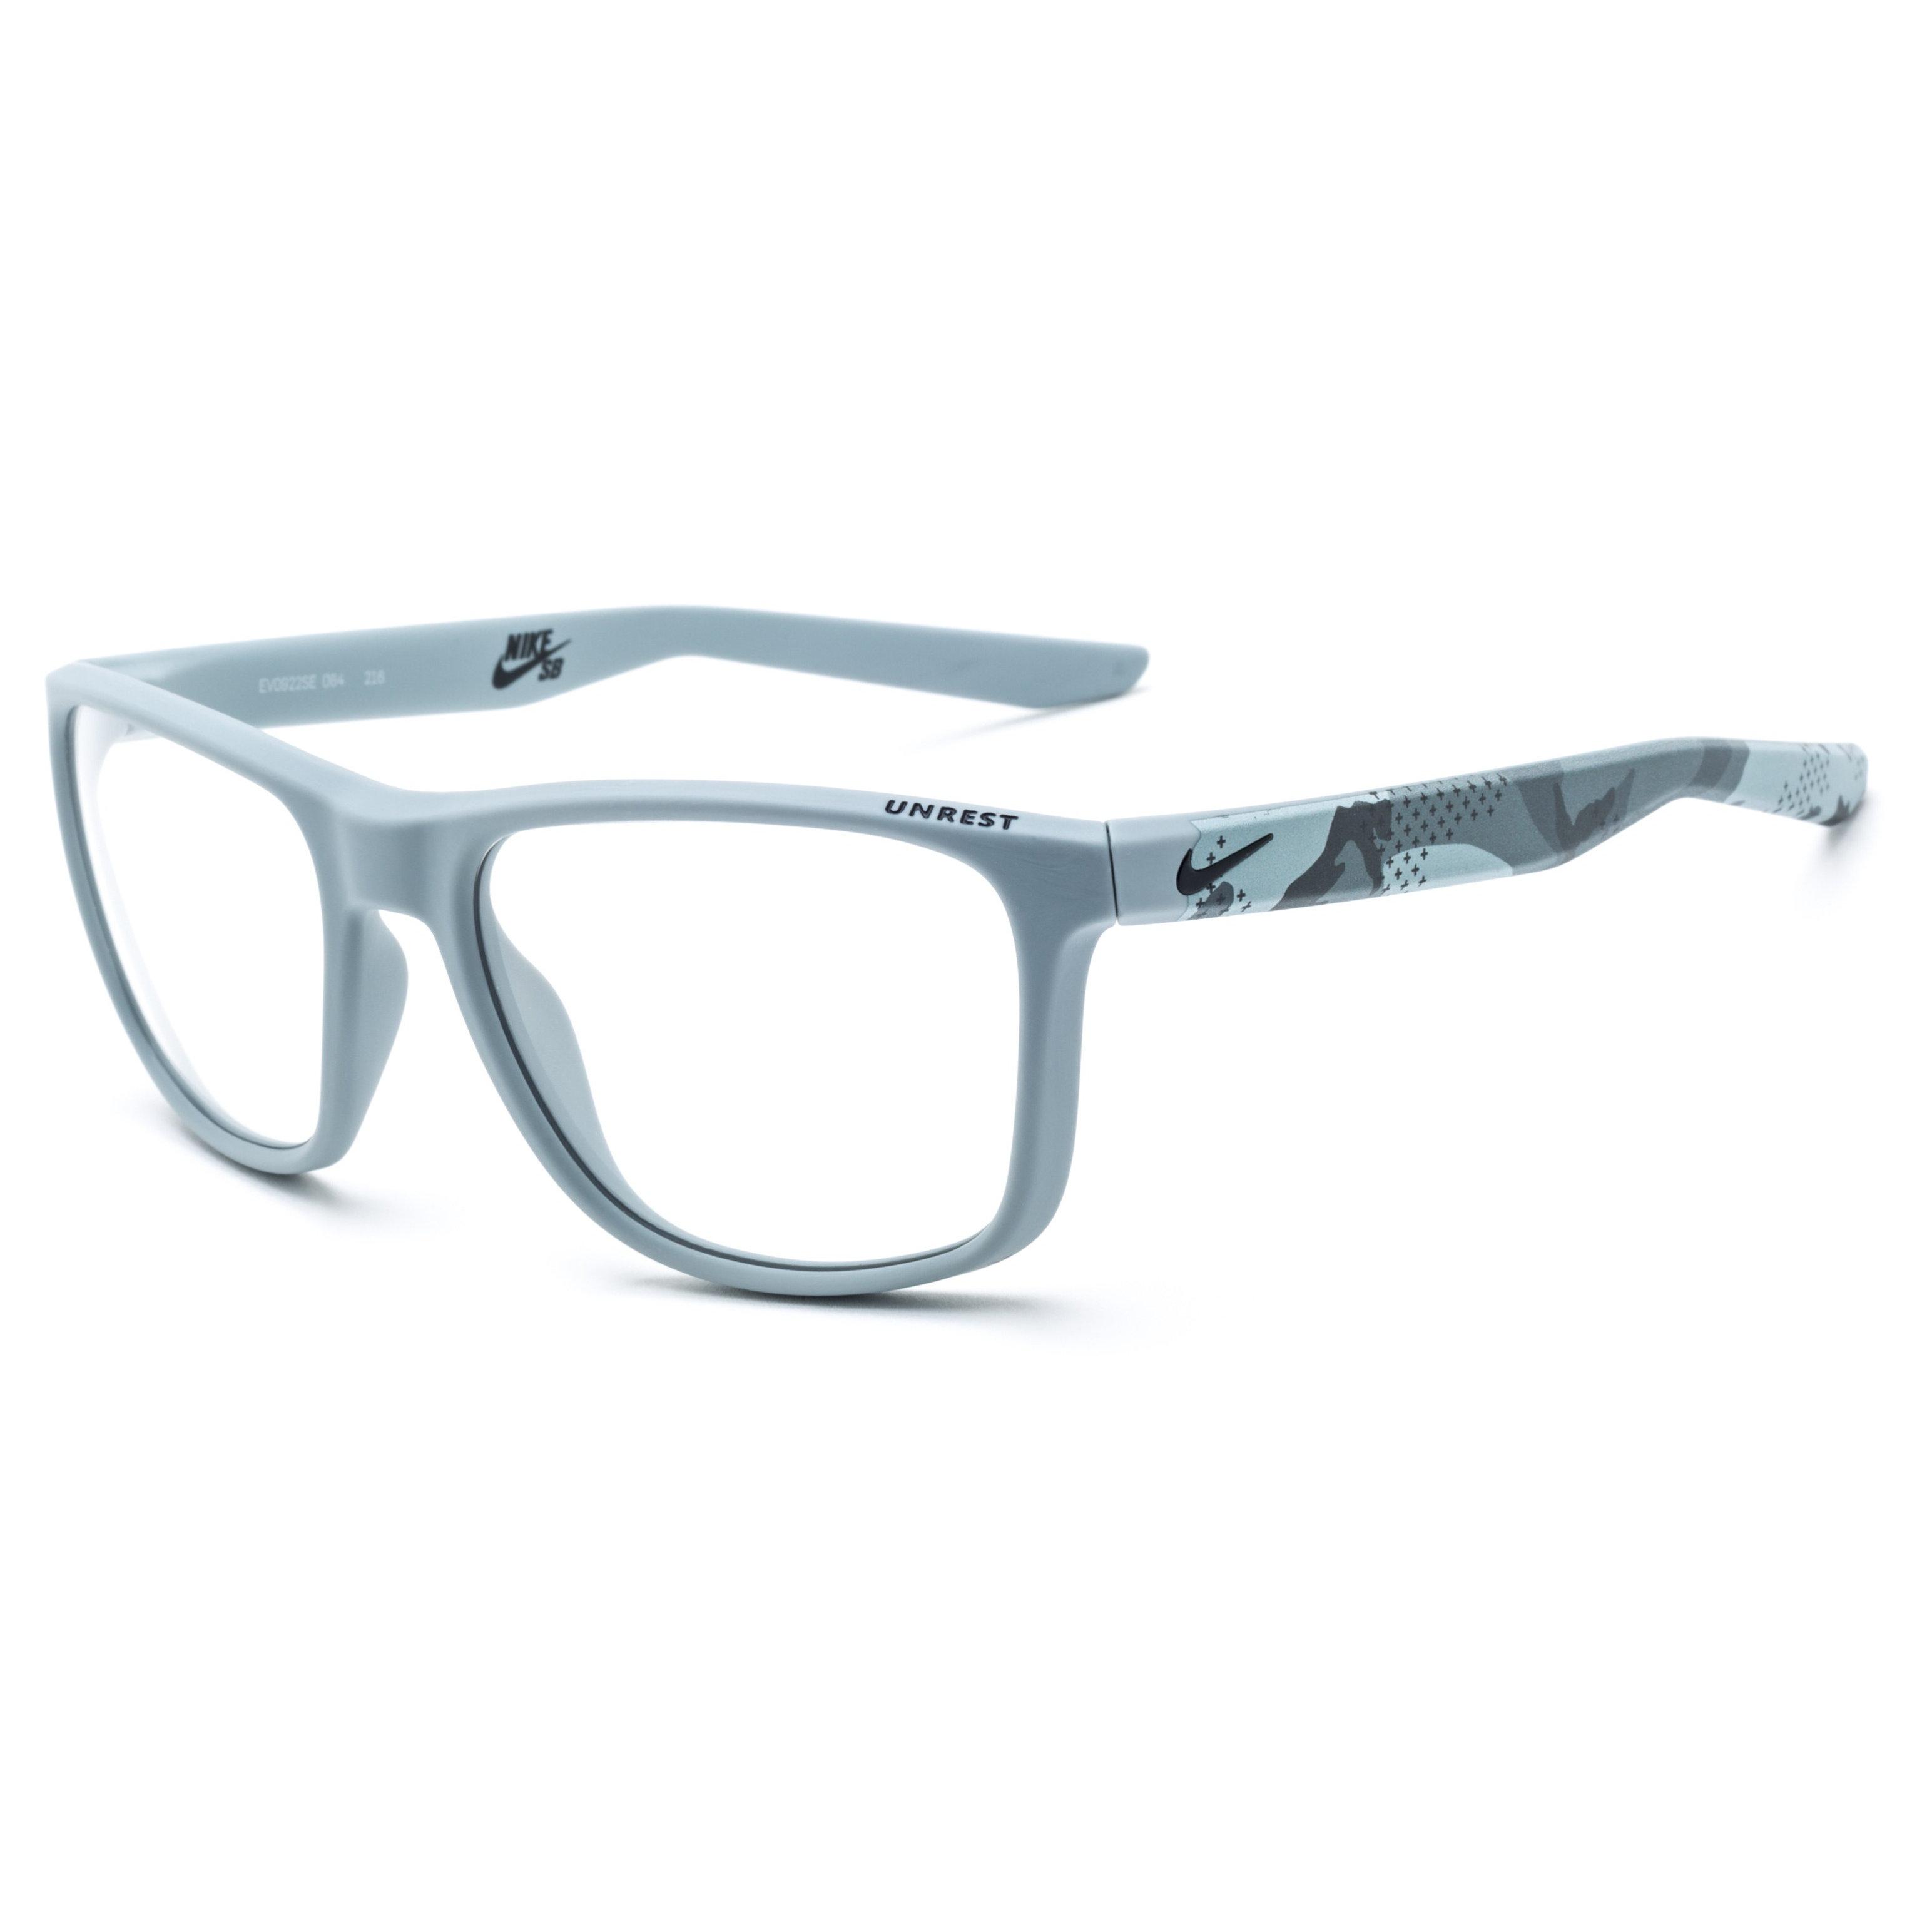 dd9b6084e48 Nike Unrest Radiation Protection Glasses